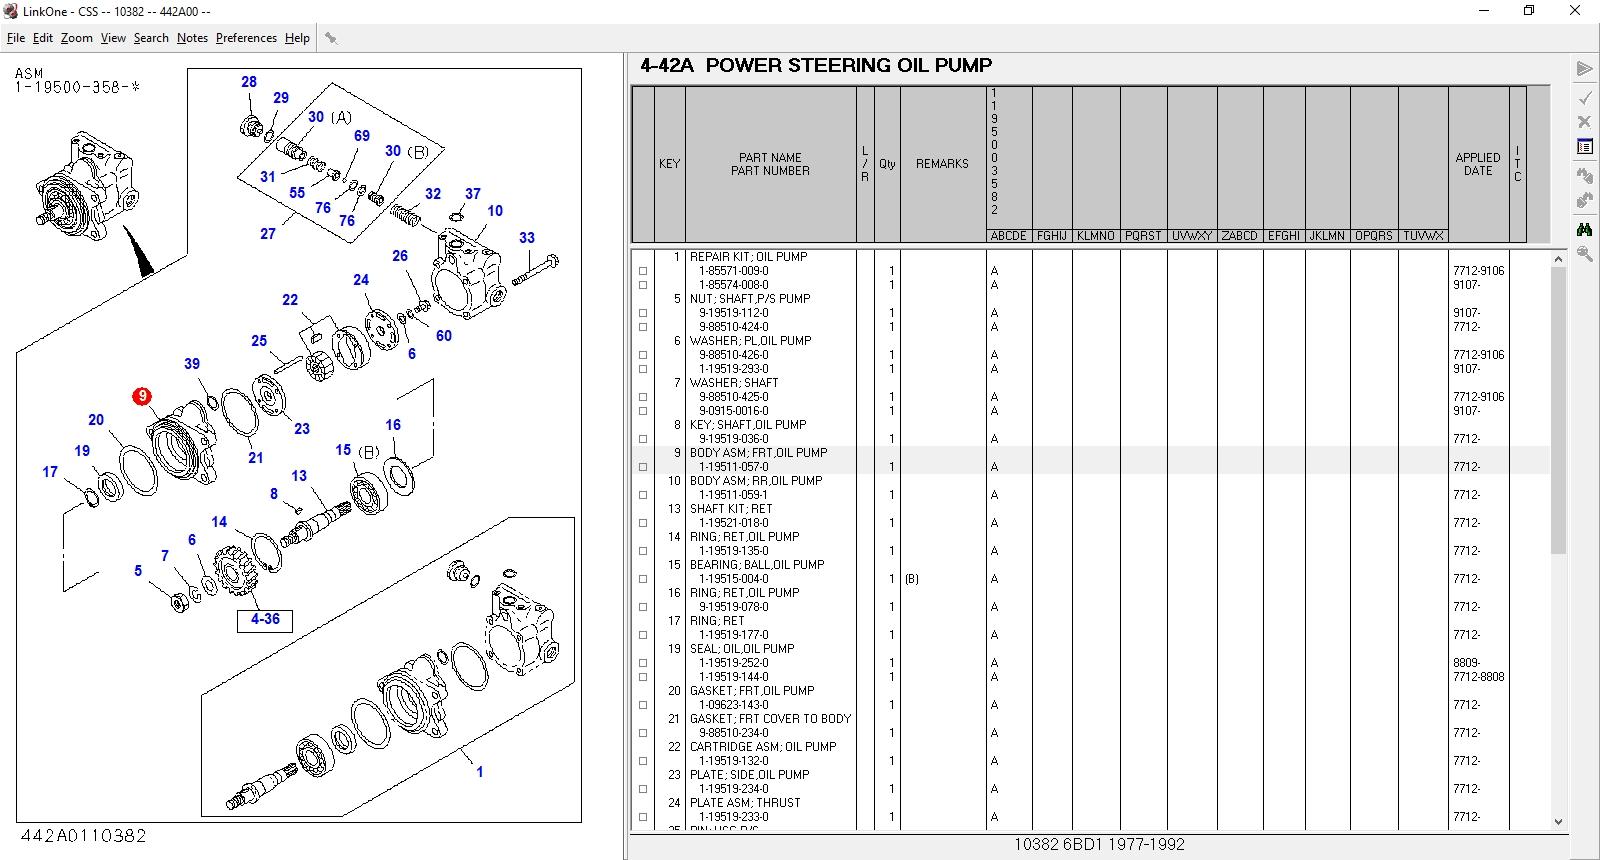 ISUZU_CSS-NET_EPC_052020_Electronic_Parts_Catalog_3